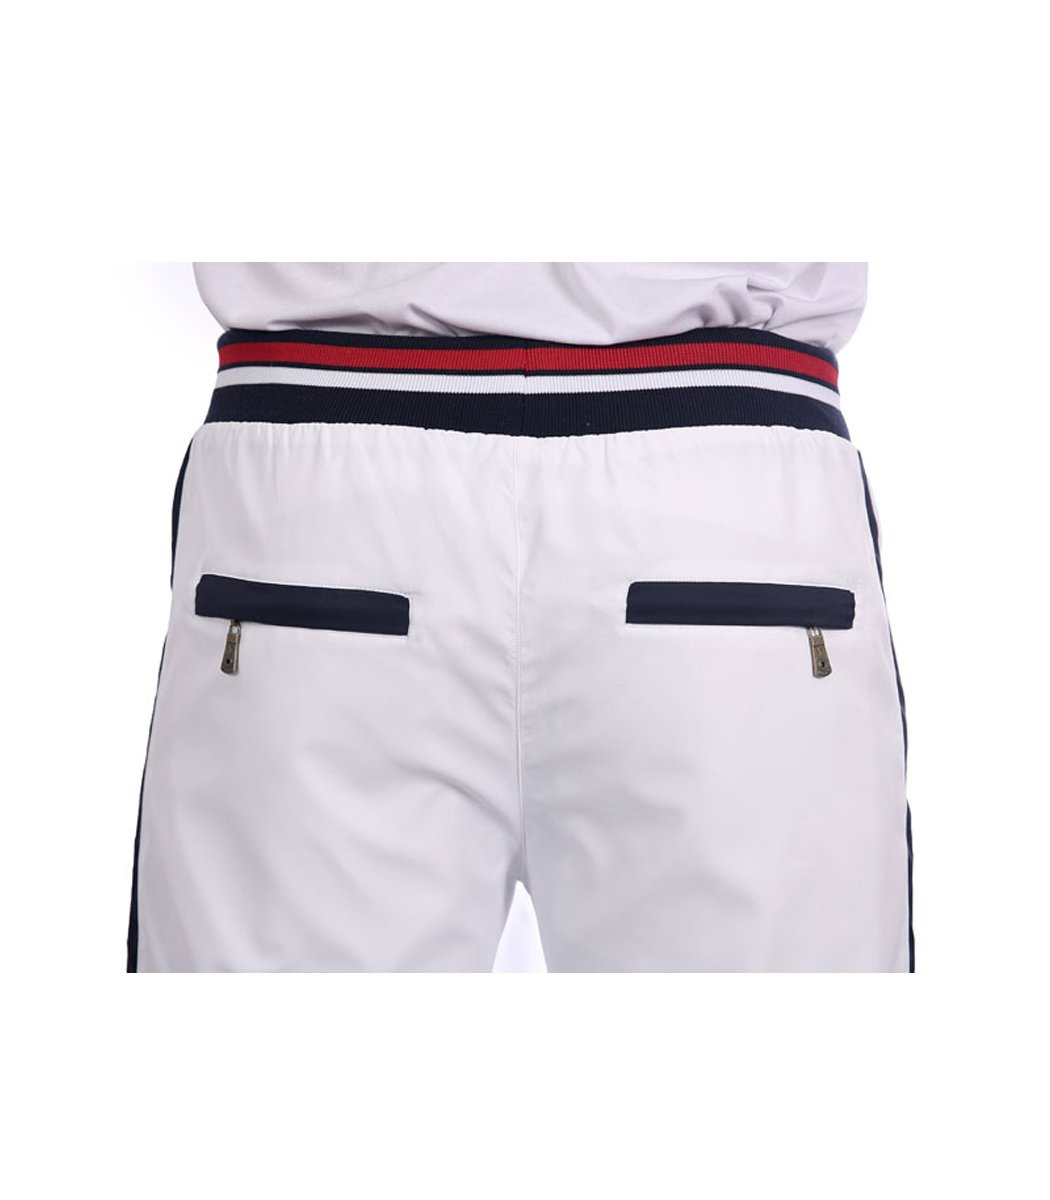 Спортивный костюм POLO Ralph Lauren Classic Белый/темно-синий - Белый - Вид 7